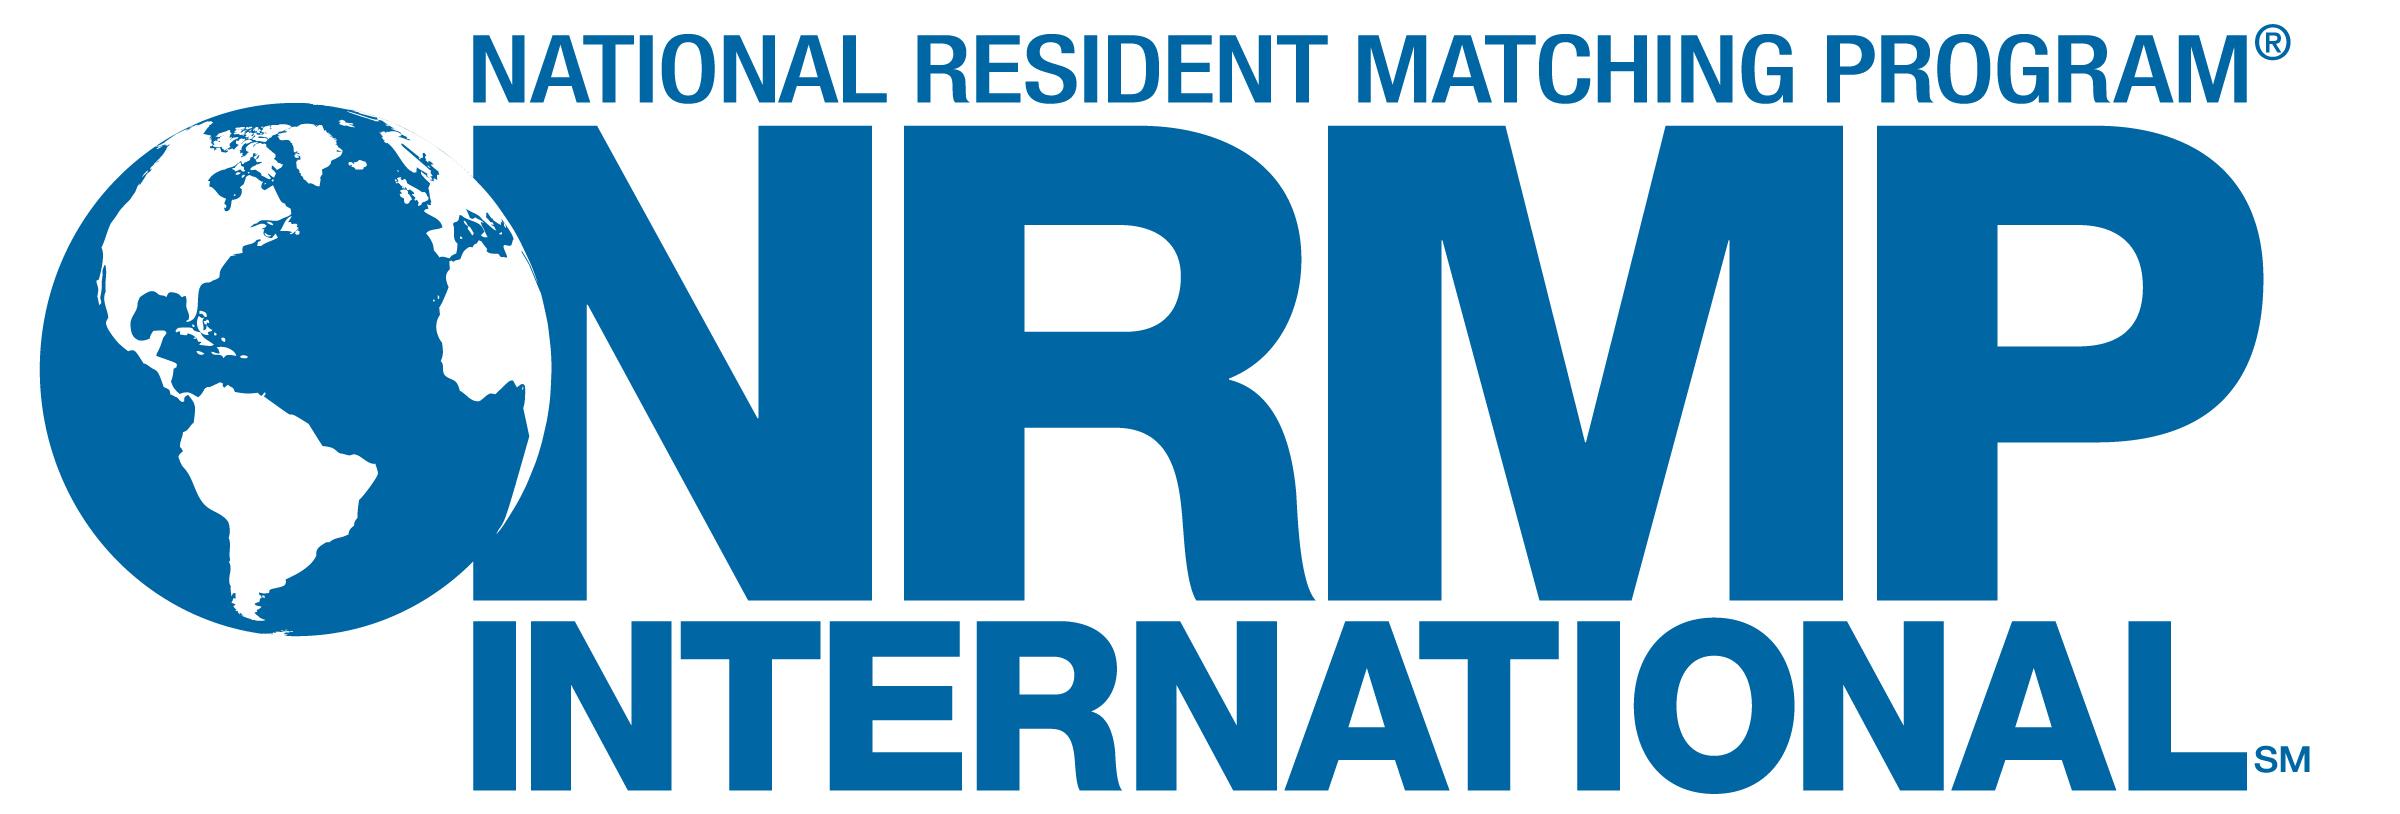 National Resident Matching Program (NRMP®) Launches NRMP